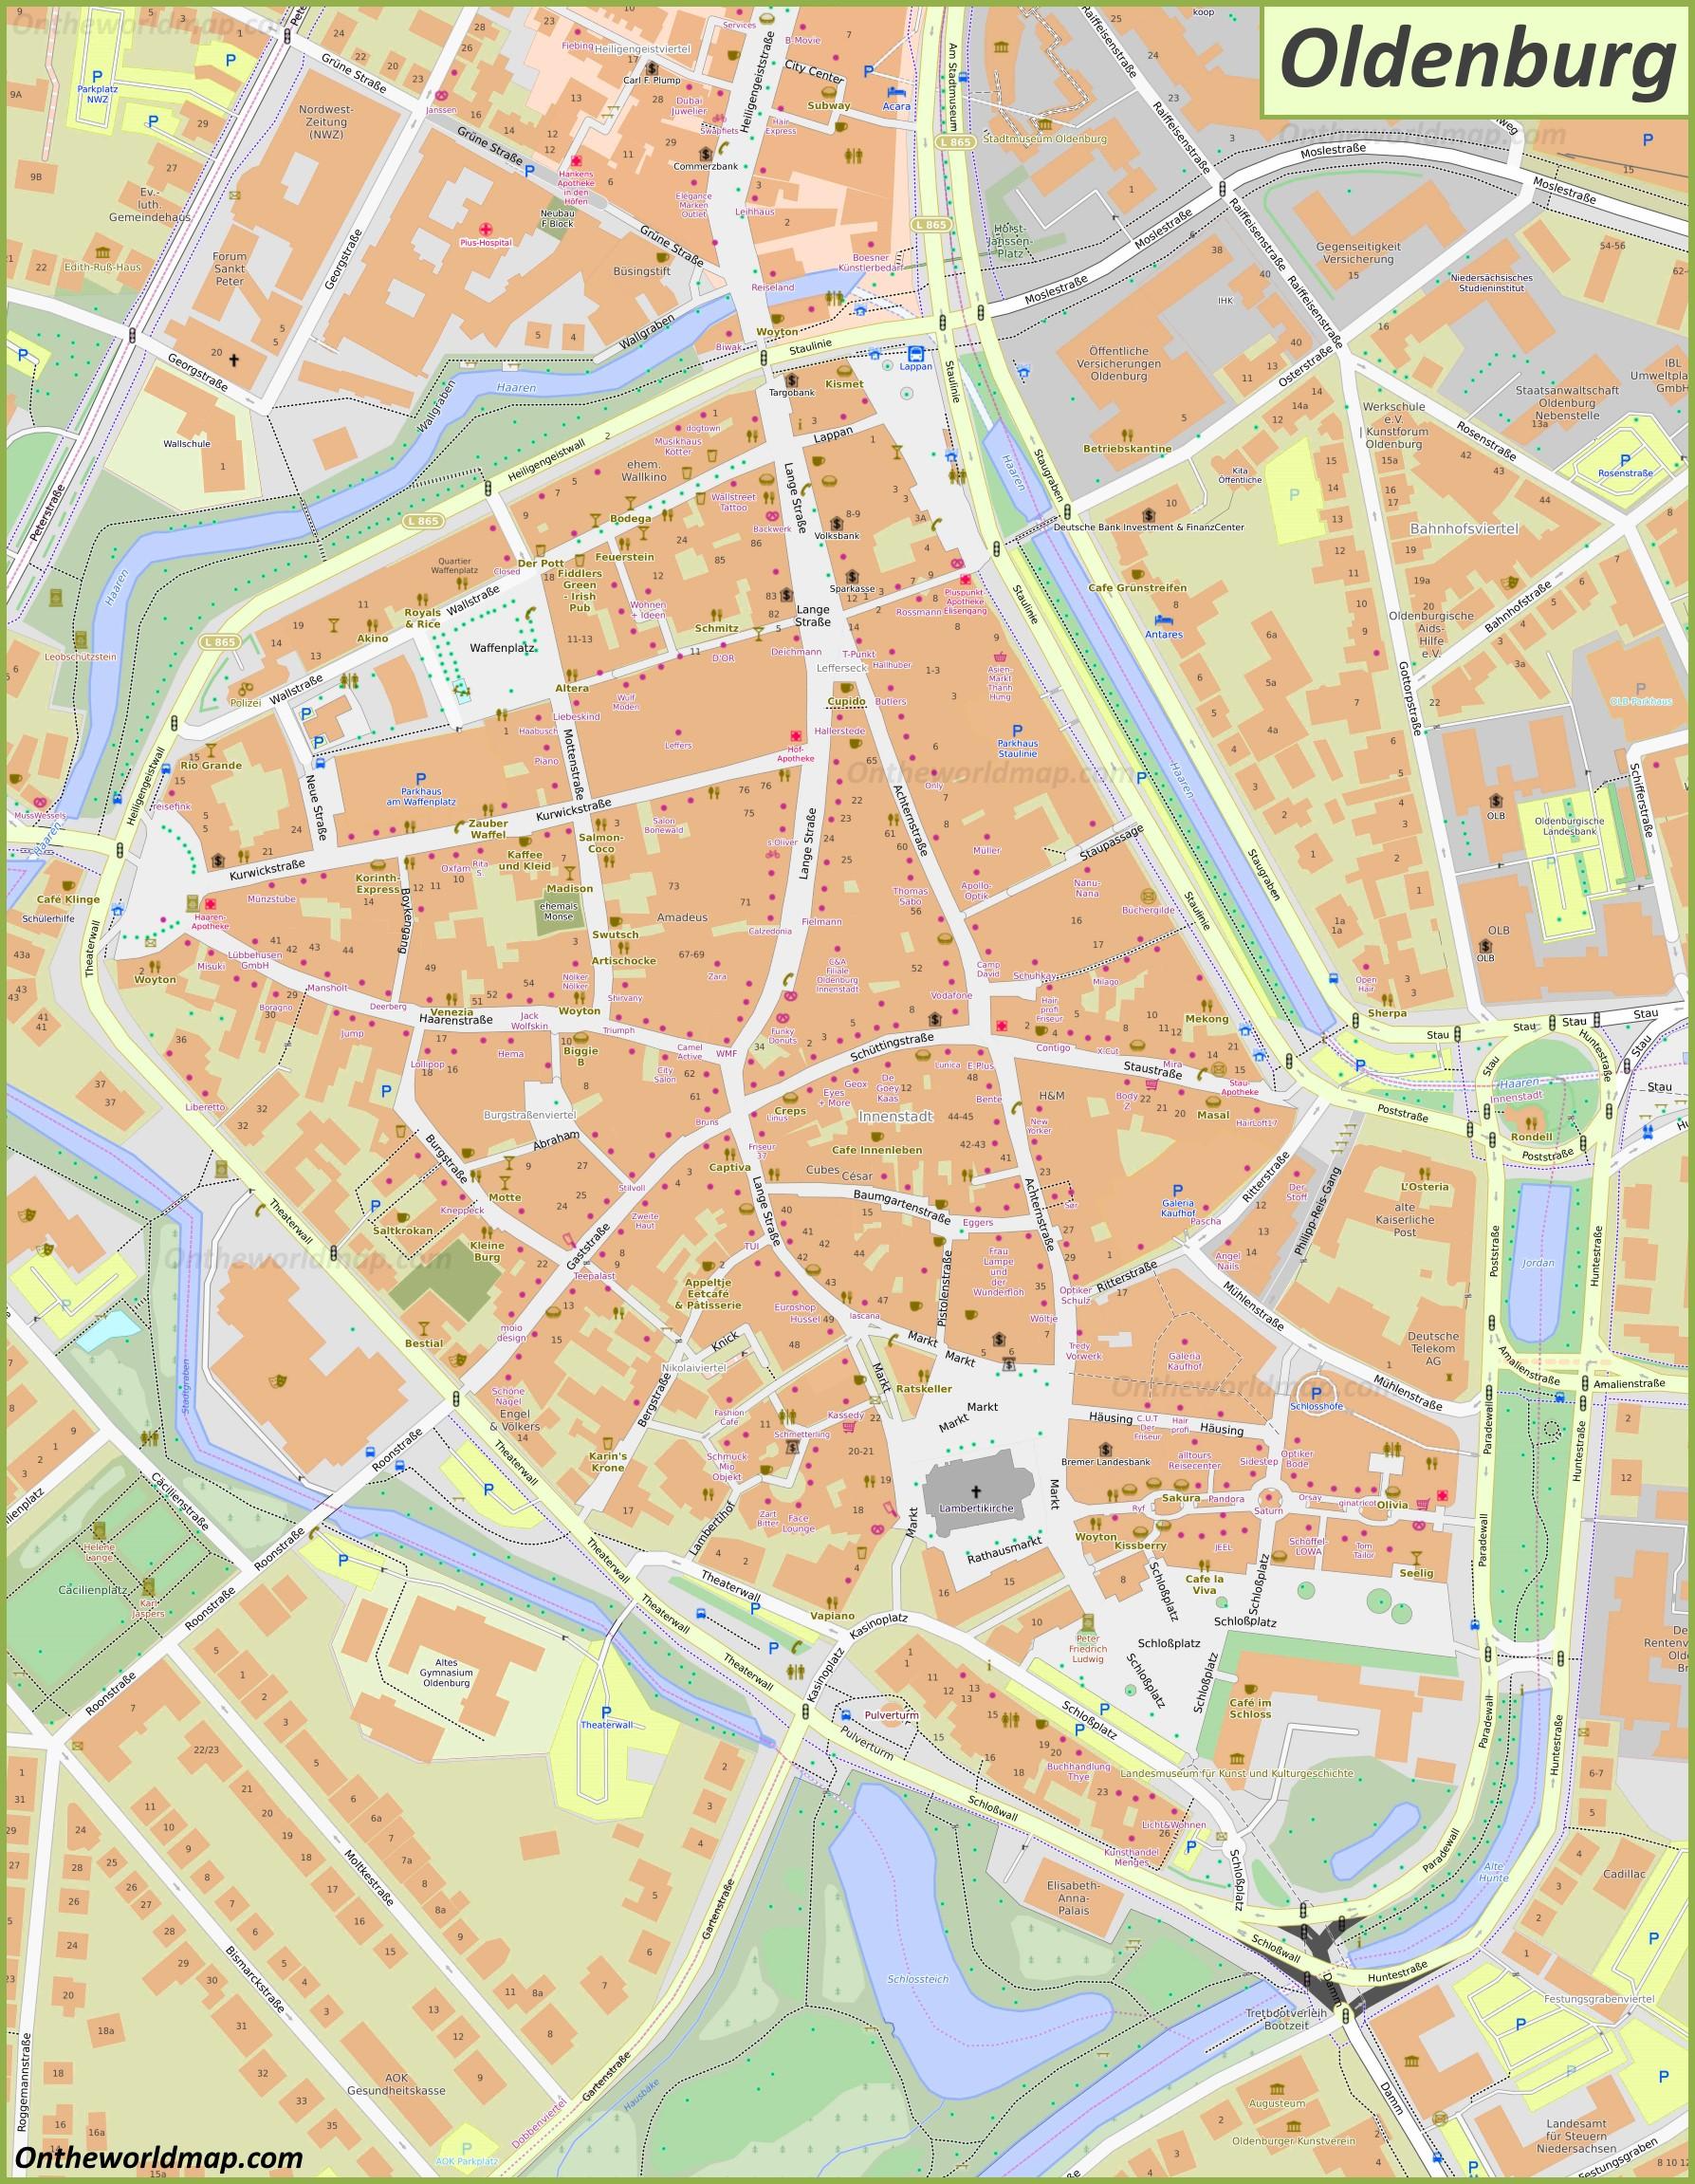 Map of Oldenburg